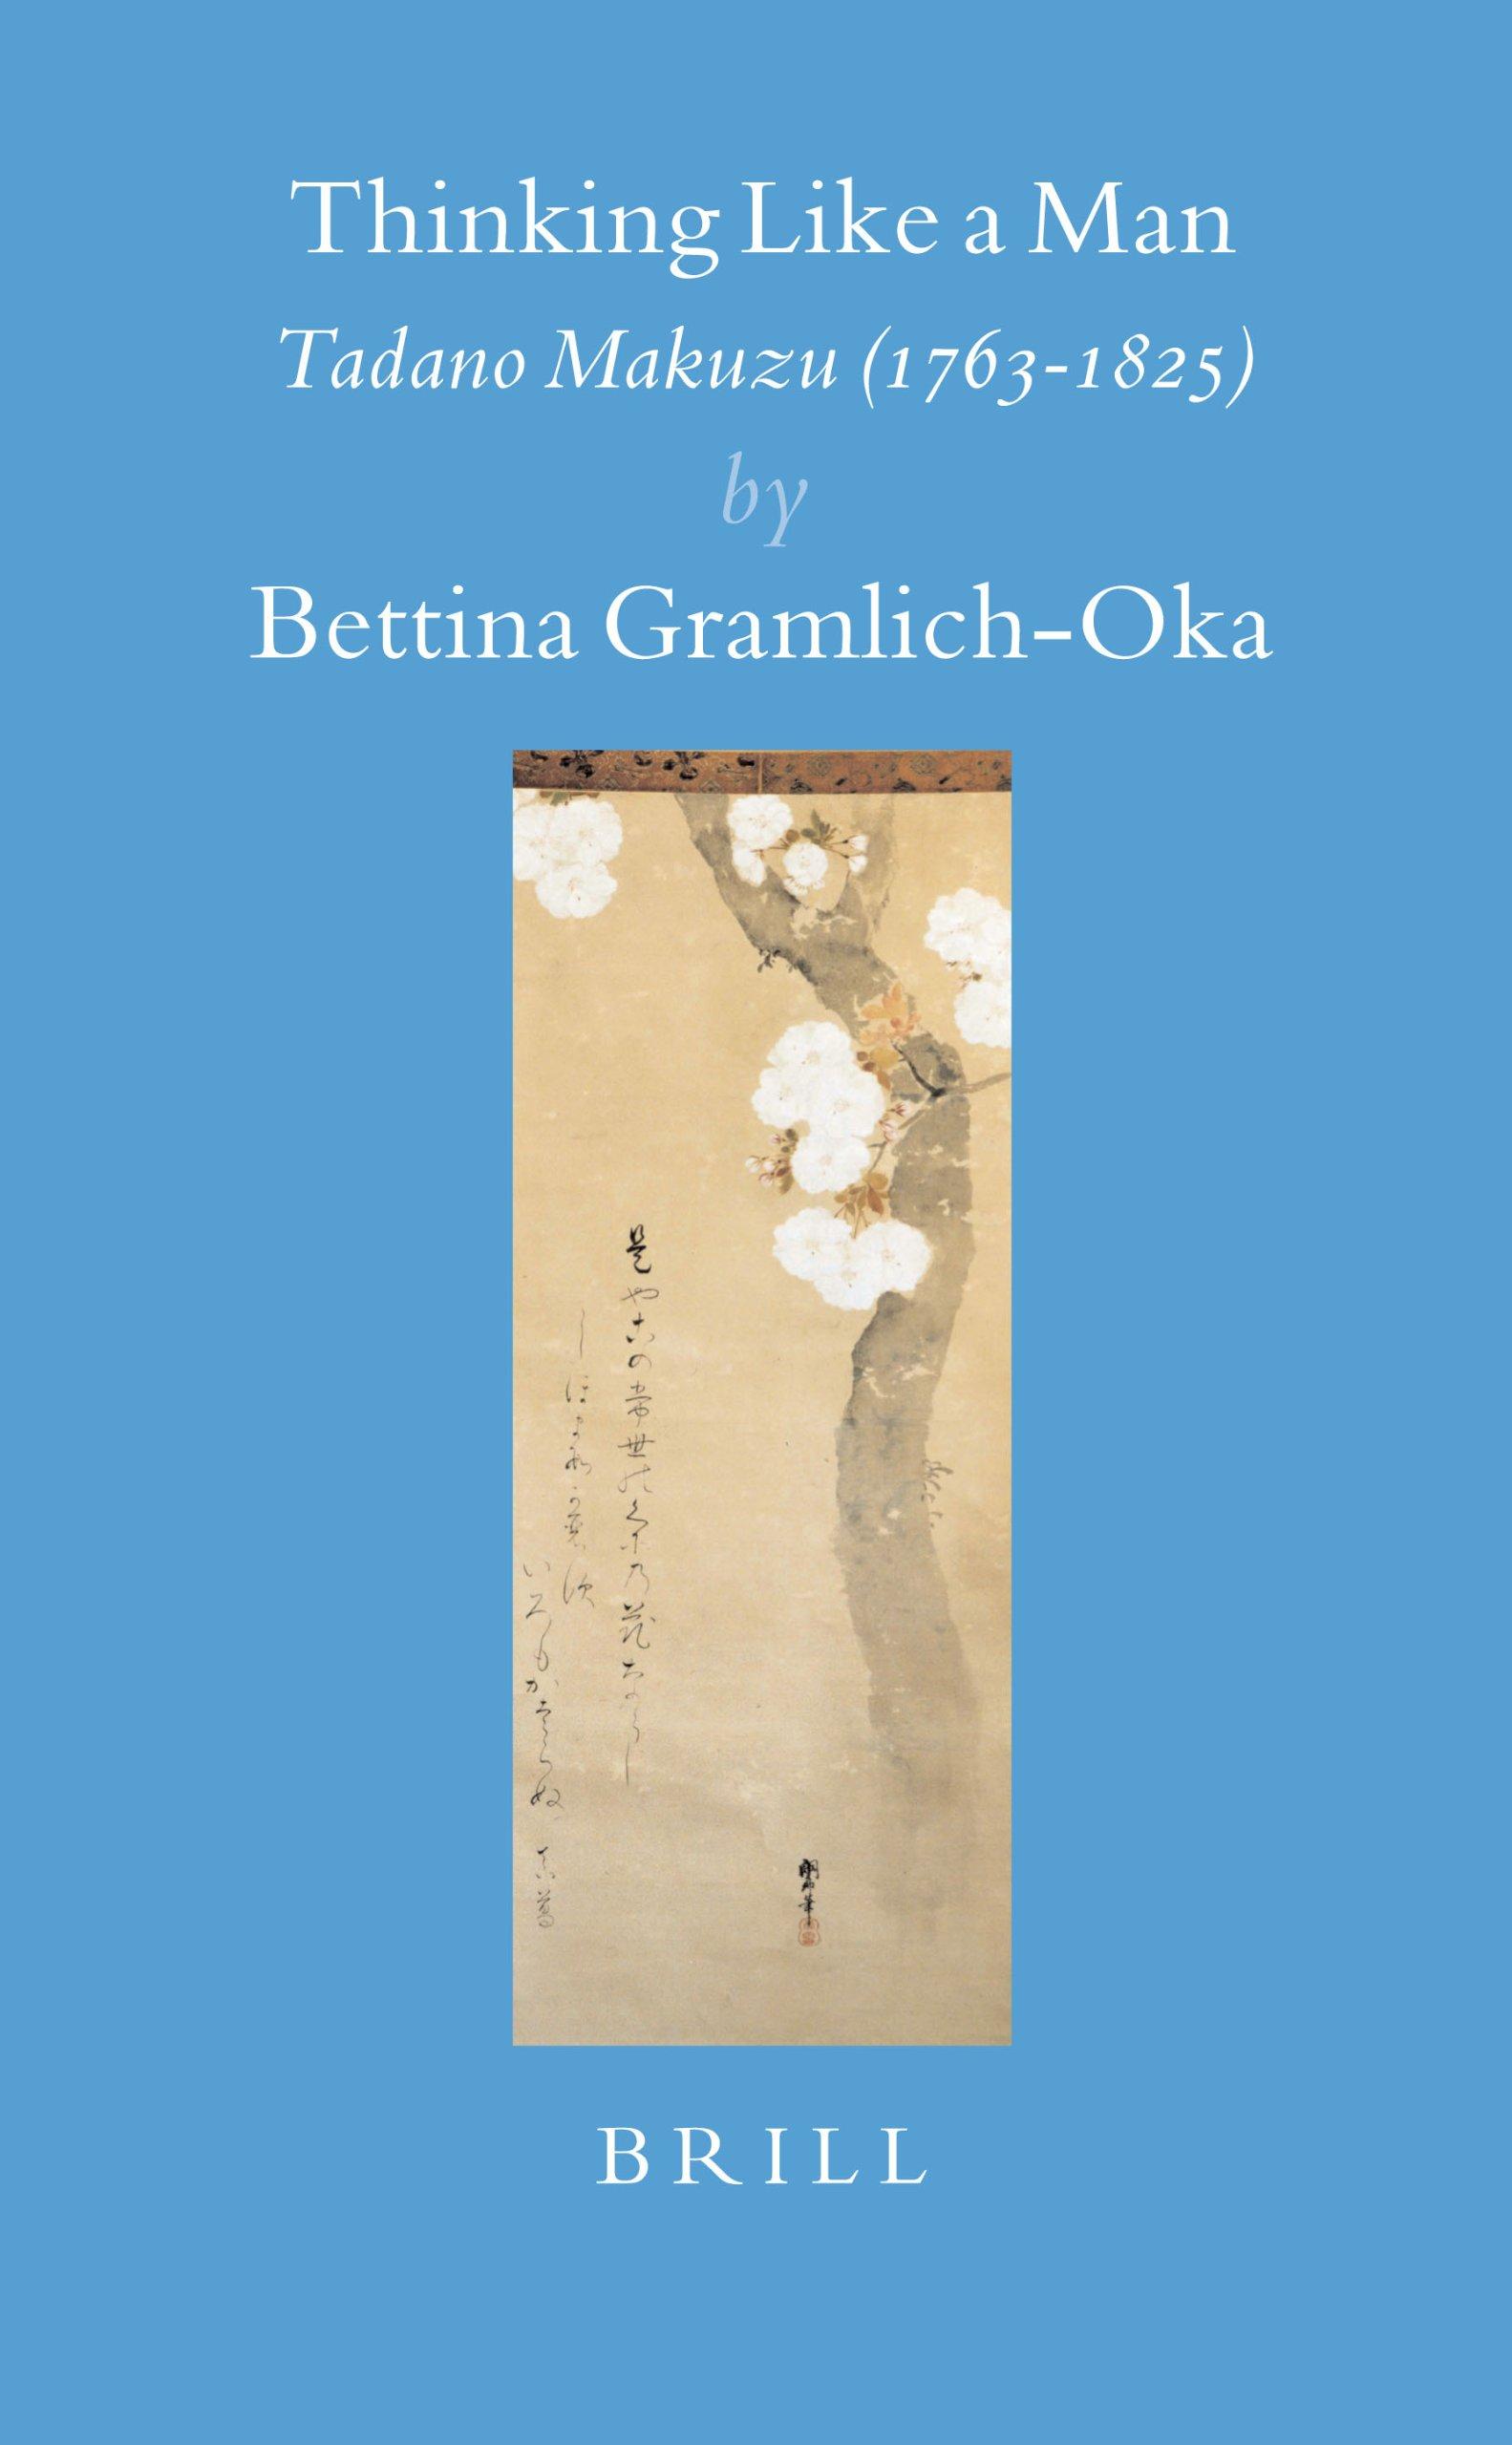 Download Thinking Like a Man: Tadano Makuzu (1763-1825) (Brill's Japanese Studies Library) ebook